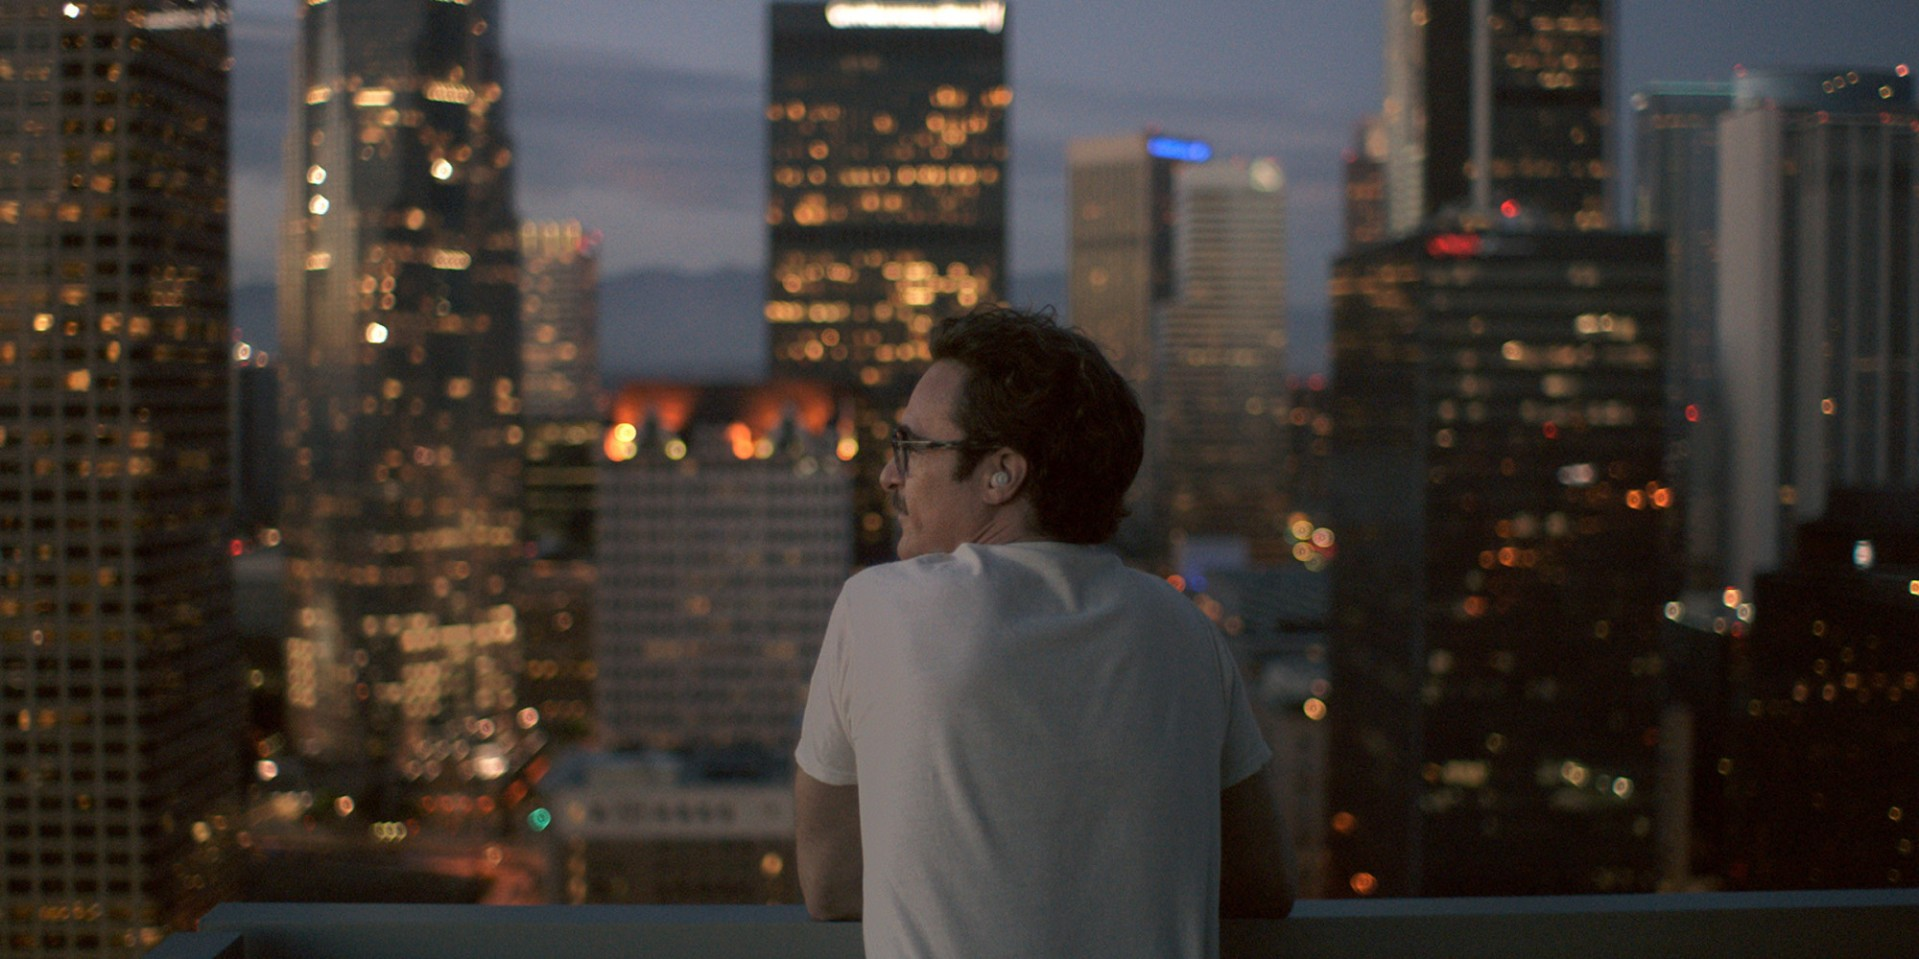 naranča bira: najbolji ljubavni filmovi: Her, Comet, Before Sunset, In Search of a Midnight Kiss, Eternal Sunshine of the Spotless Mind